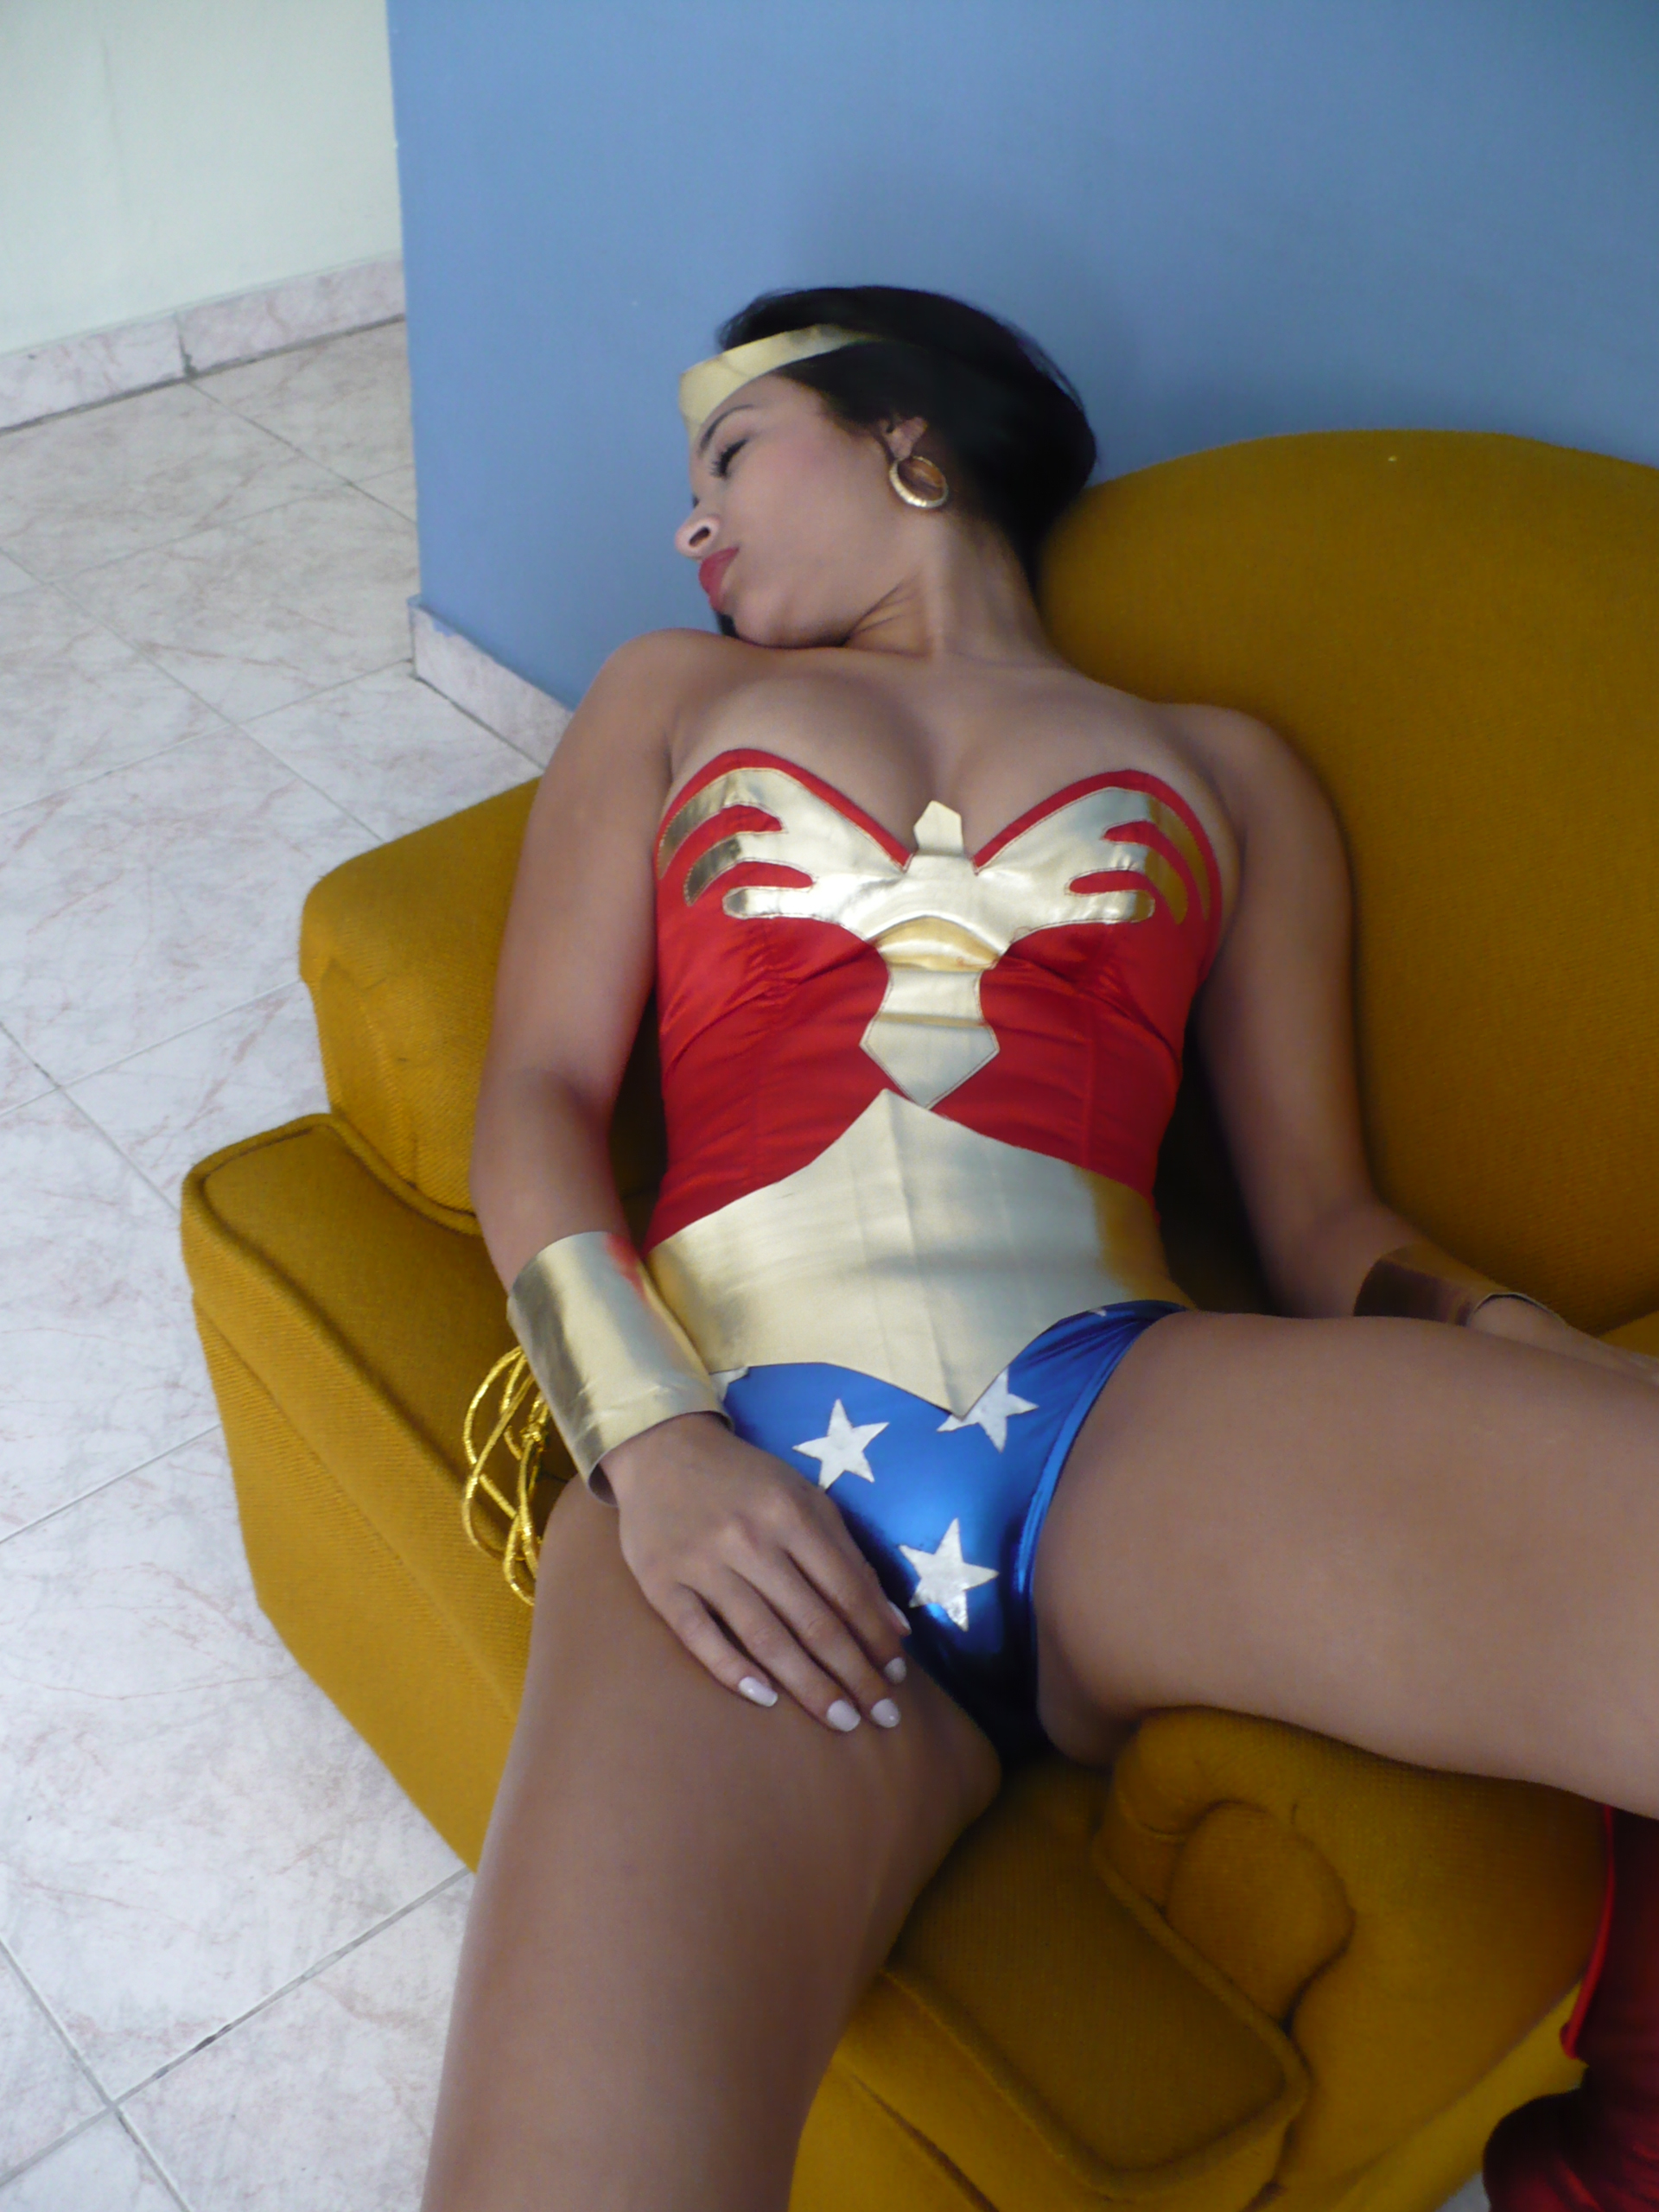 Sexy Wonder Woman: Amazon chloroformed 3 by gcsuperheroines on DeviantArt